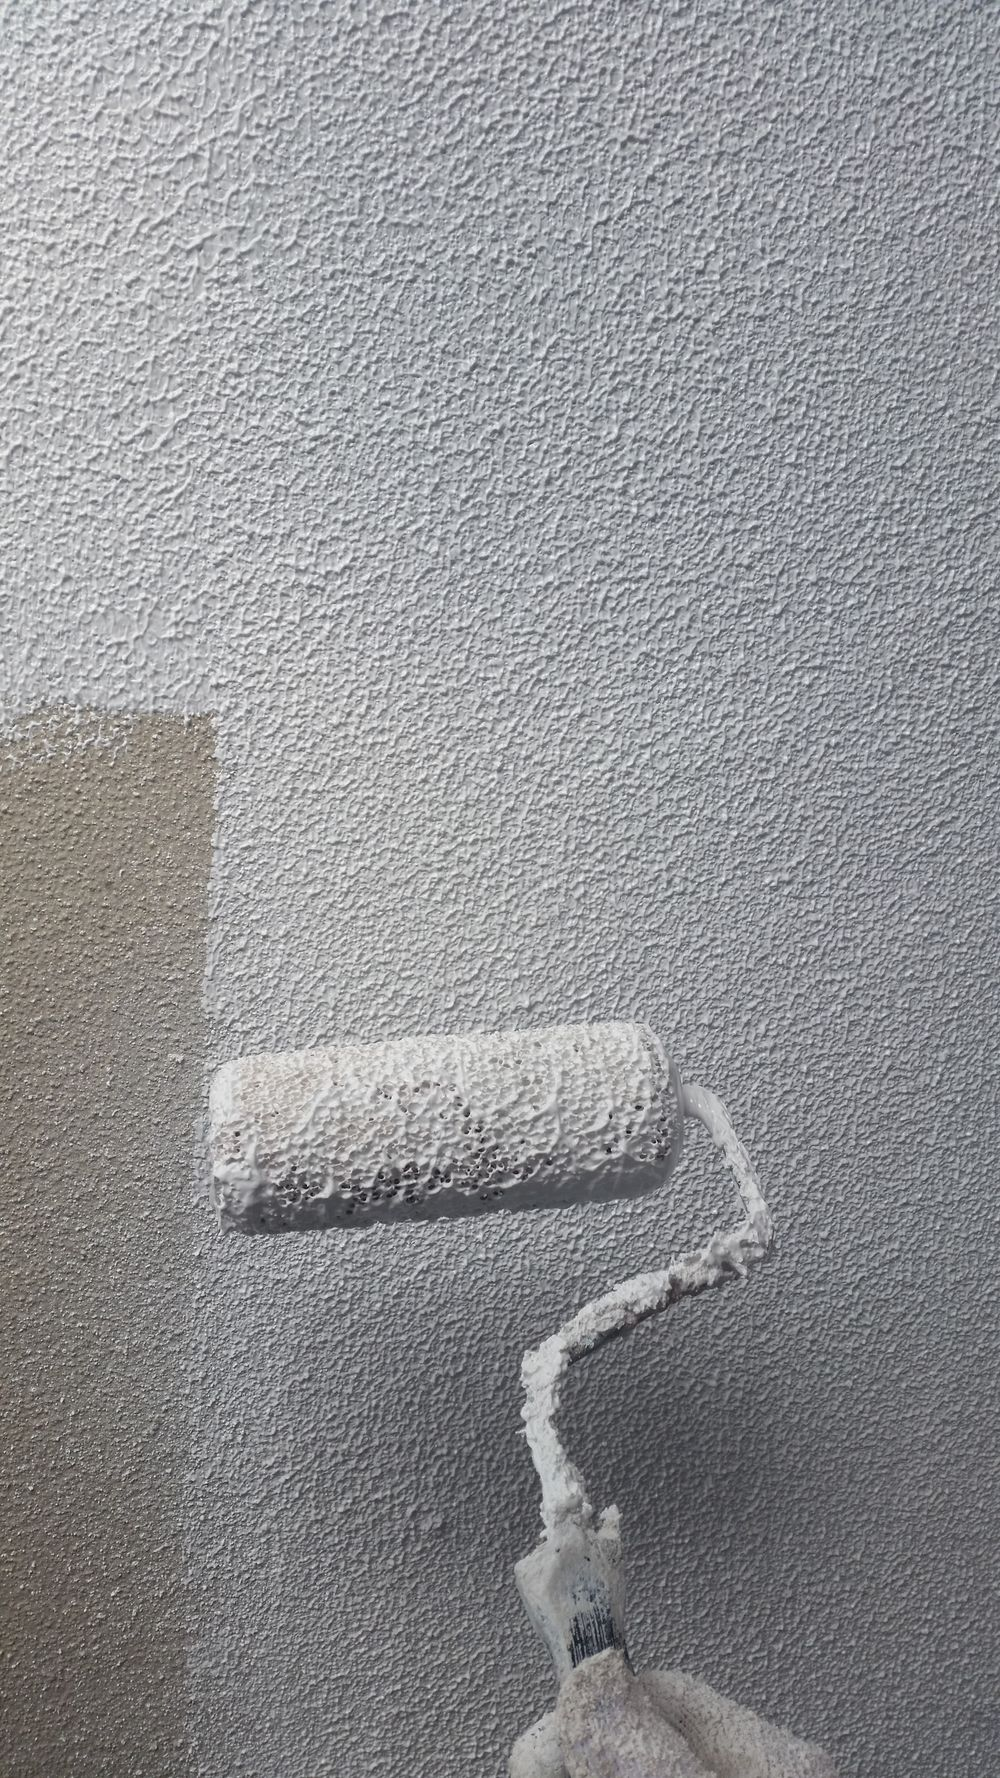 外壁塗装 屋根塗装 モルタル